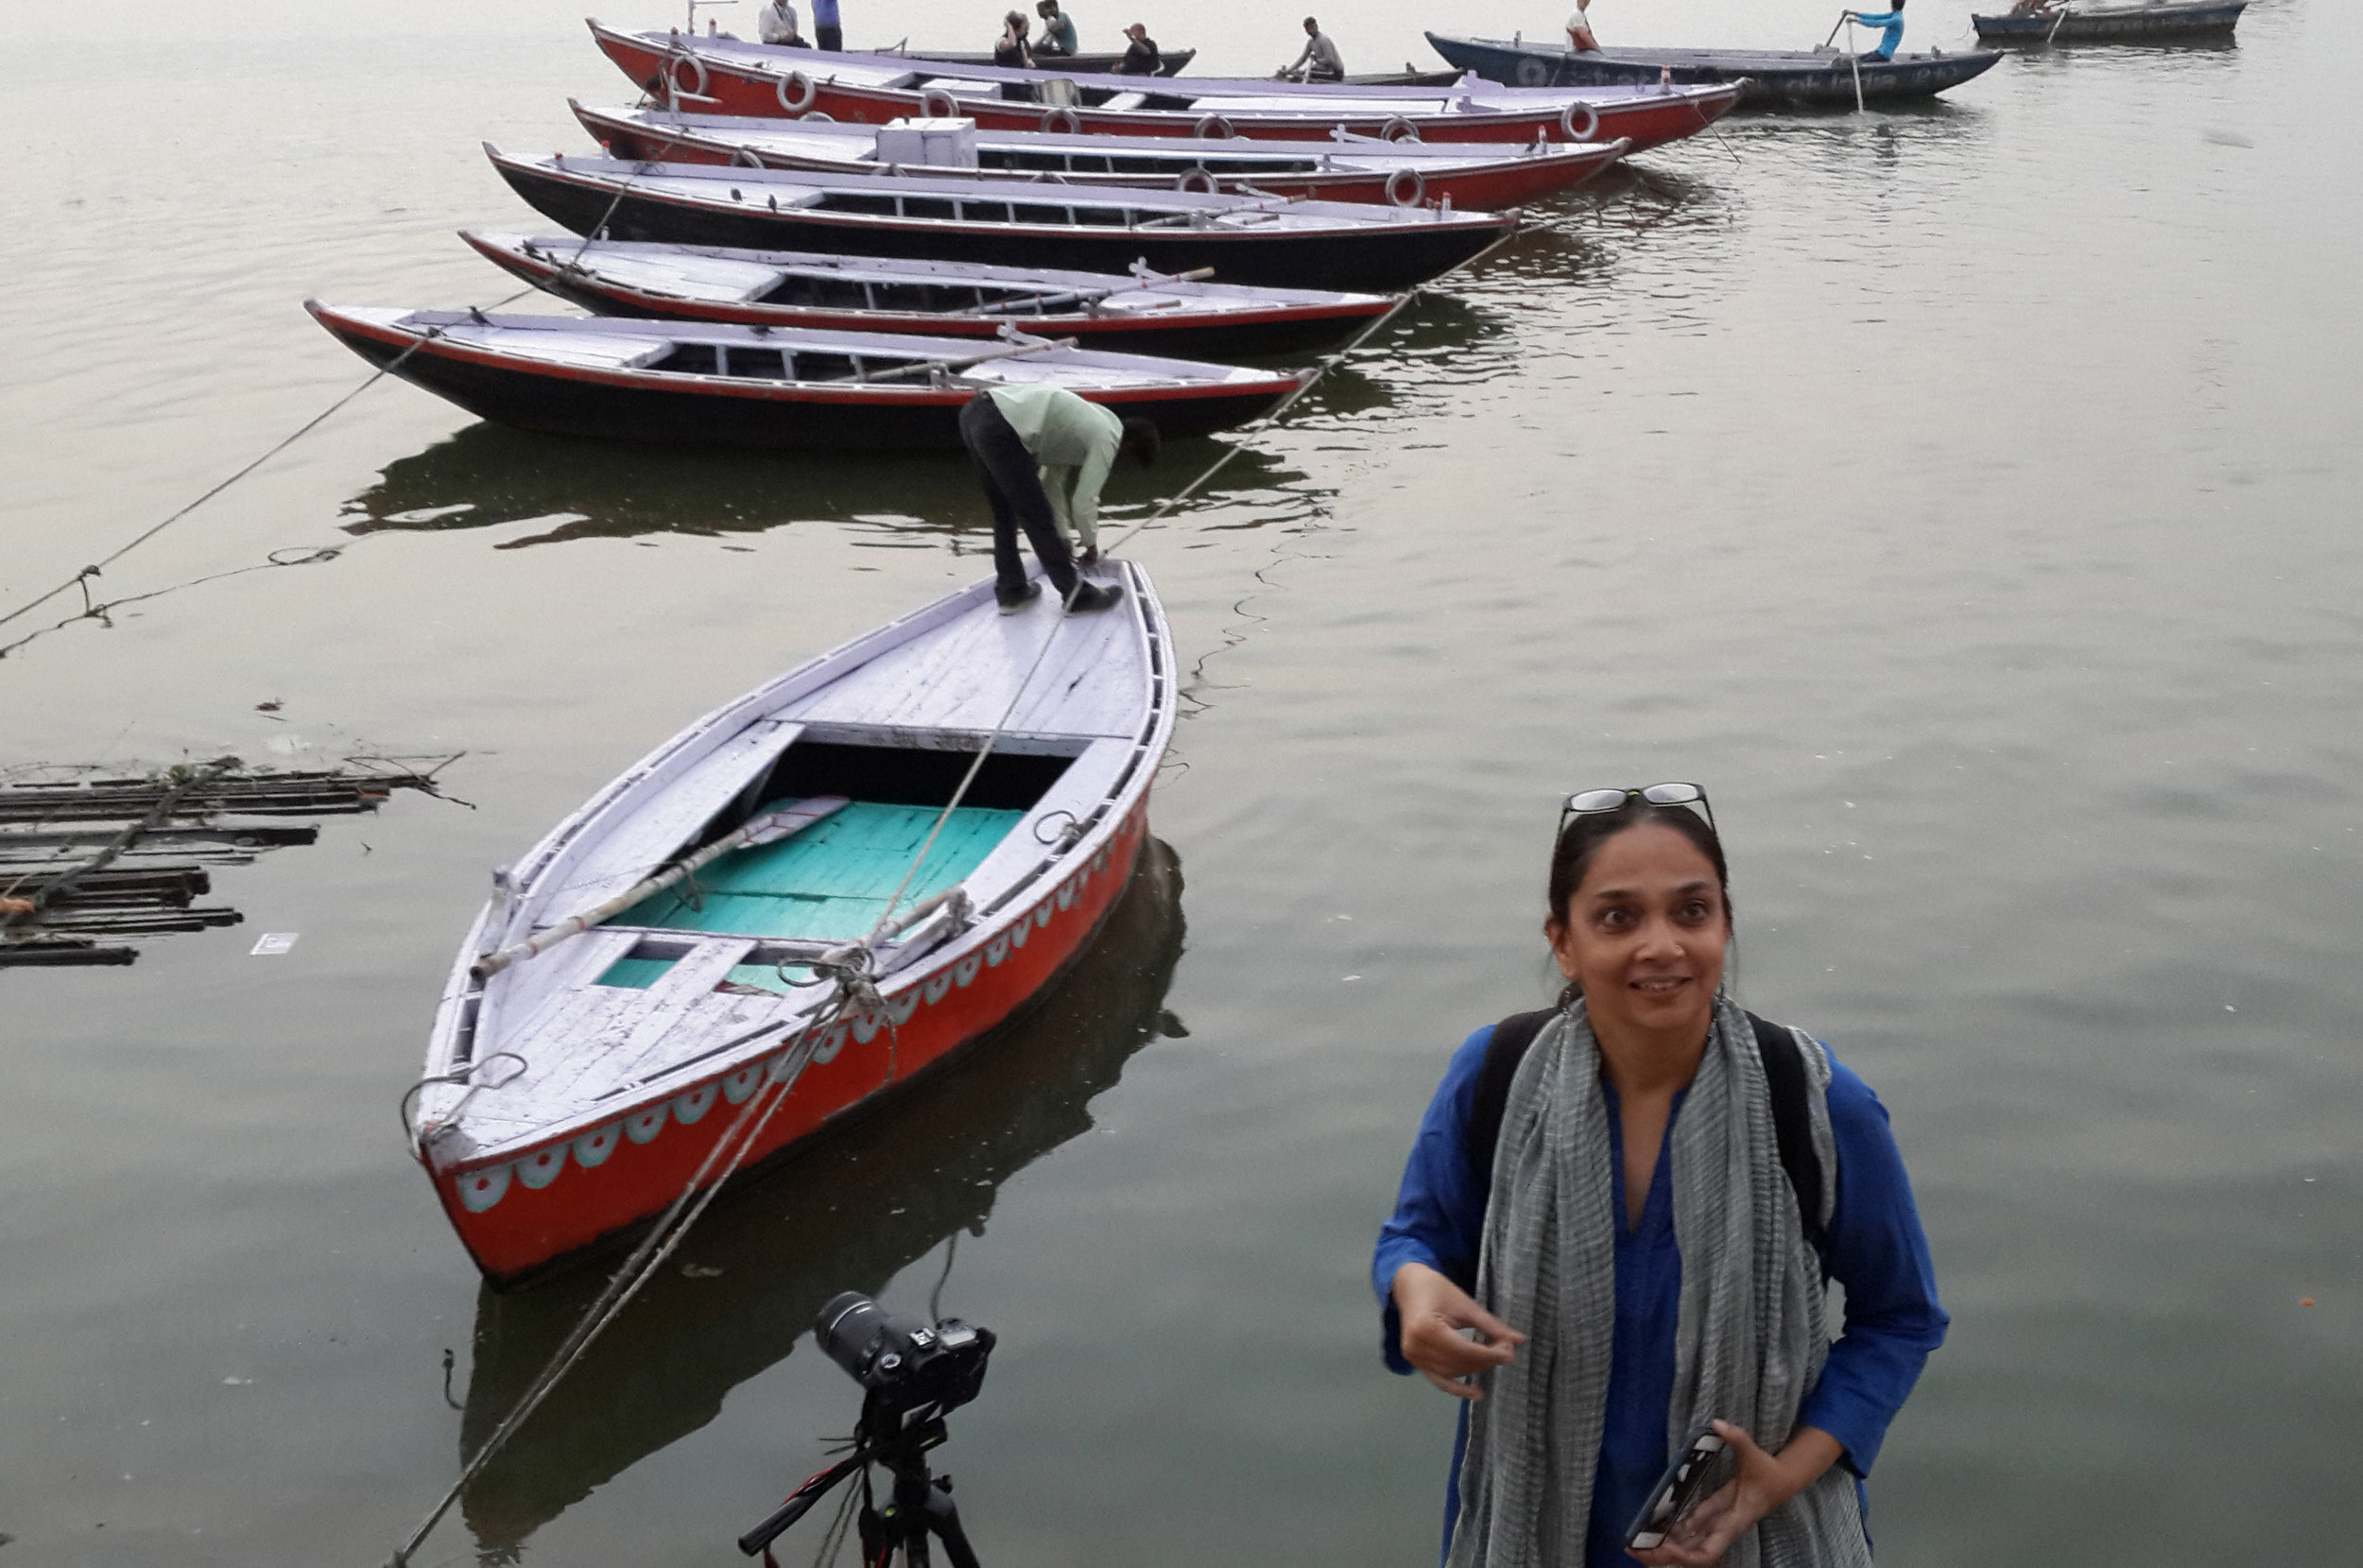 9d_Mathur3_field work in Varanasi_photocredit_Alka Mathur.jpg